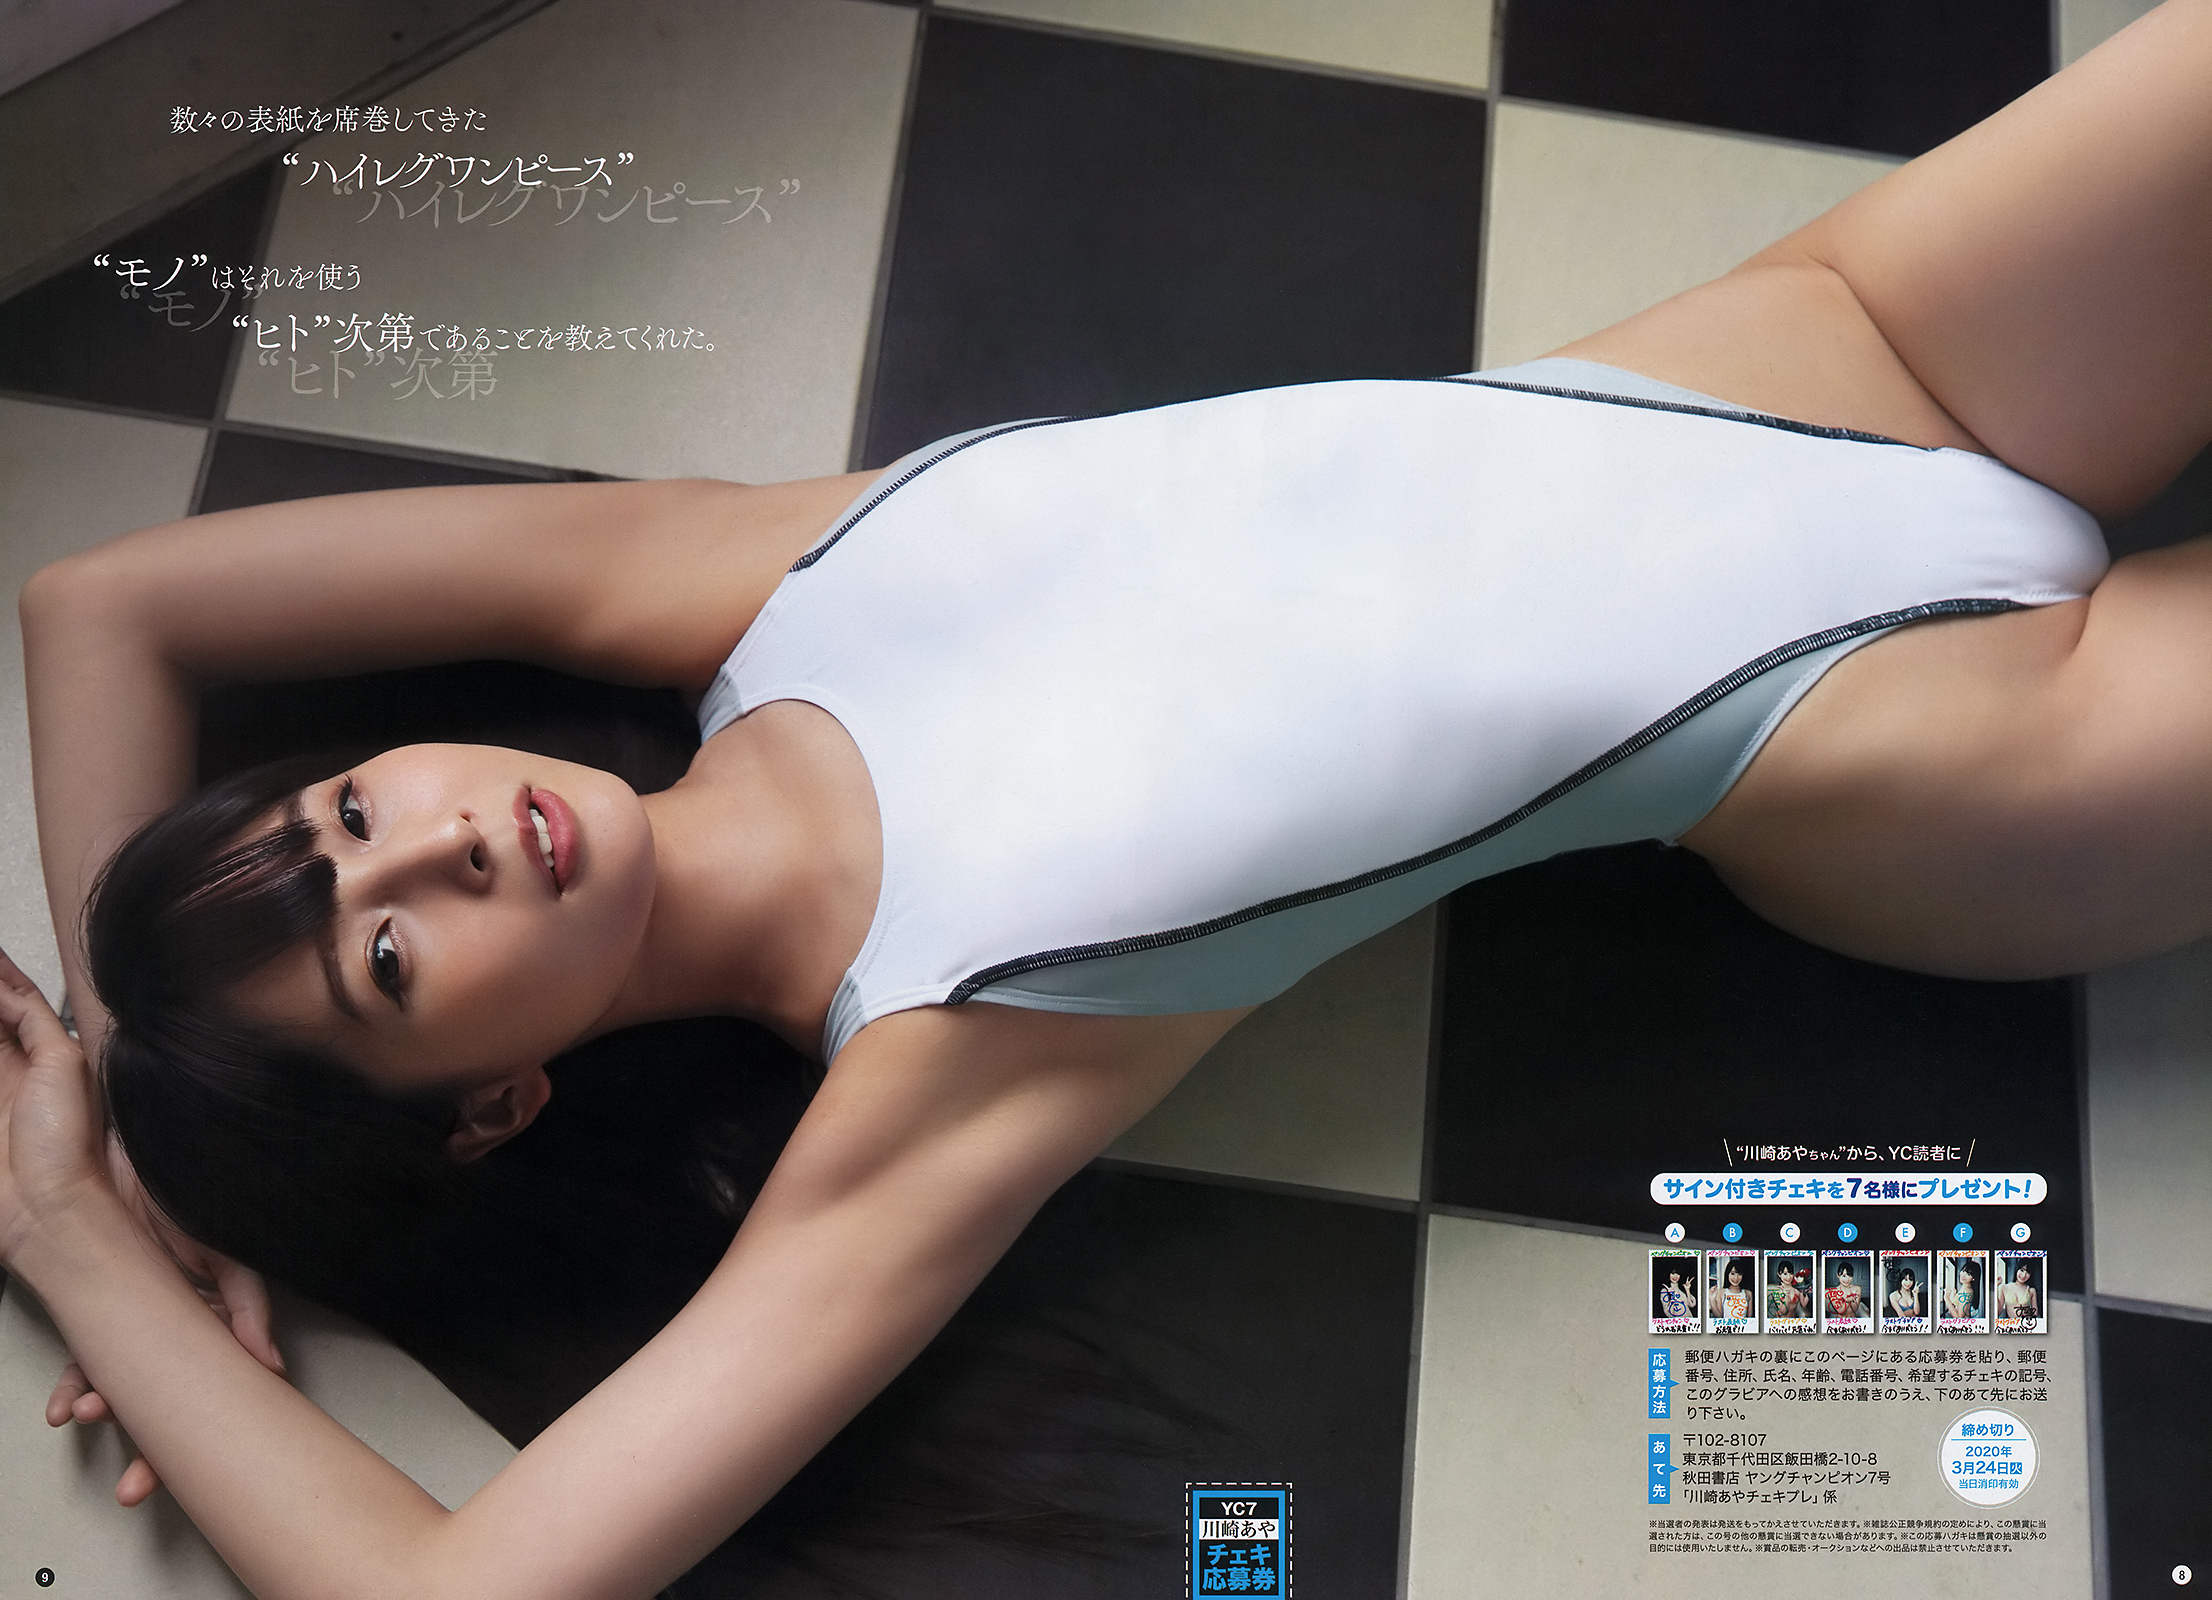 Young Champion 川崎绫06-07